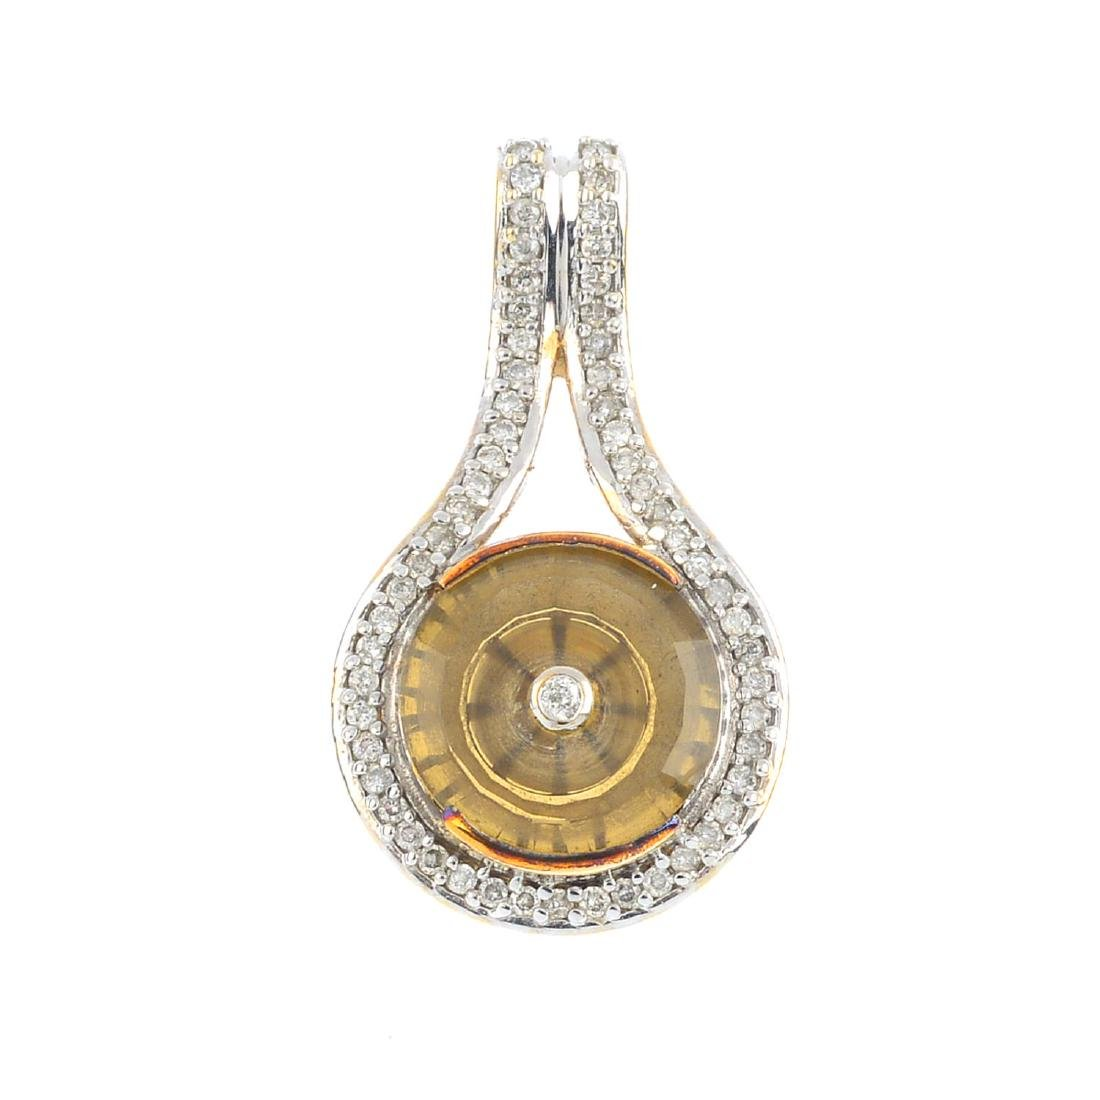 A 9ct gold diamond and smoky quartz pendant. The